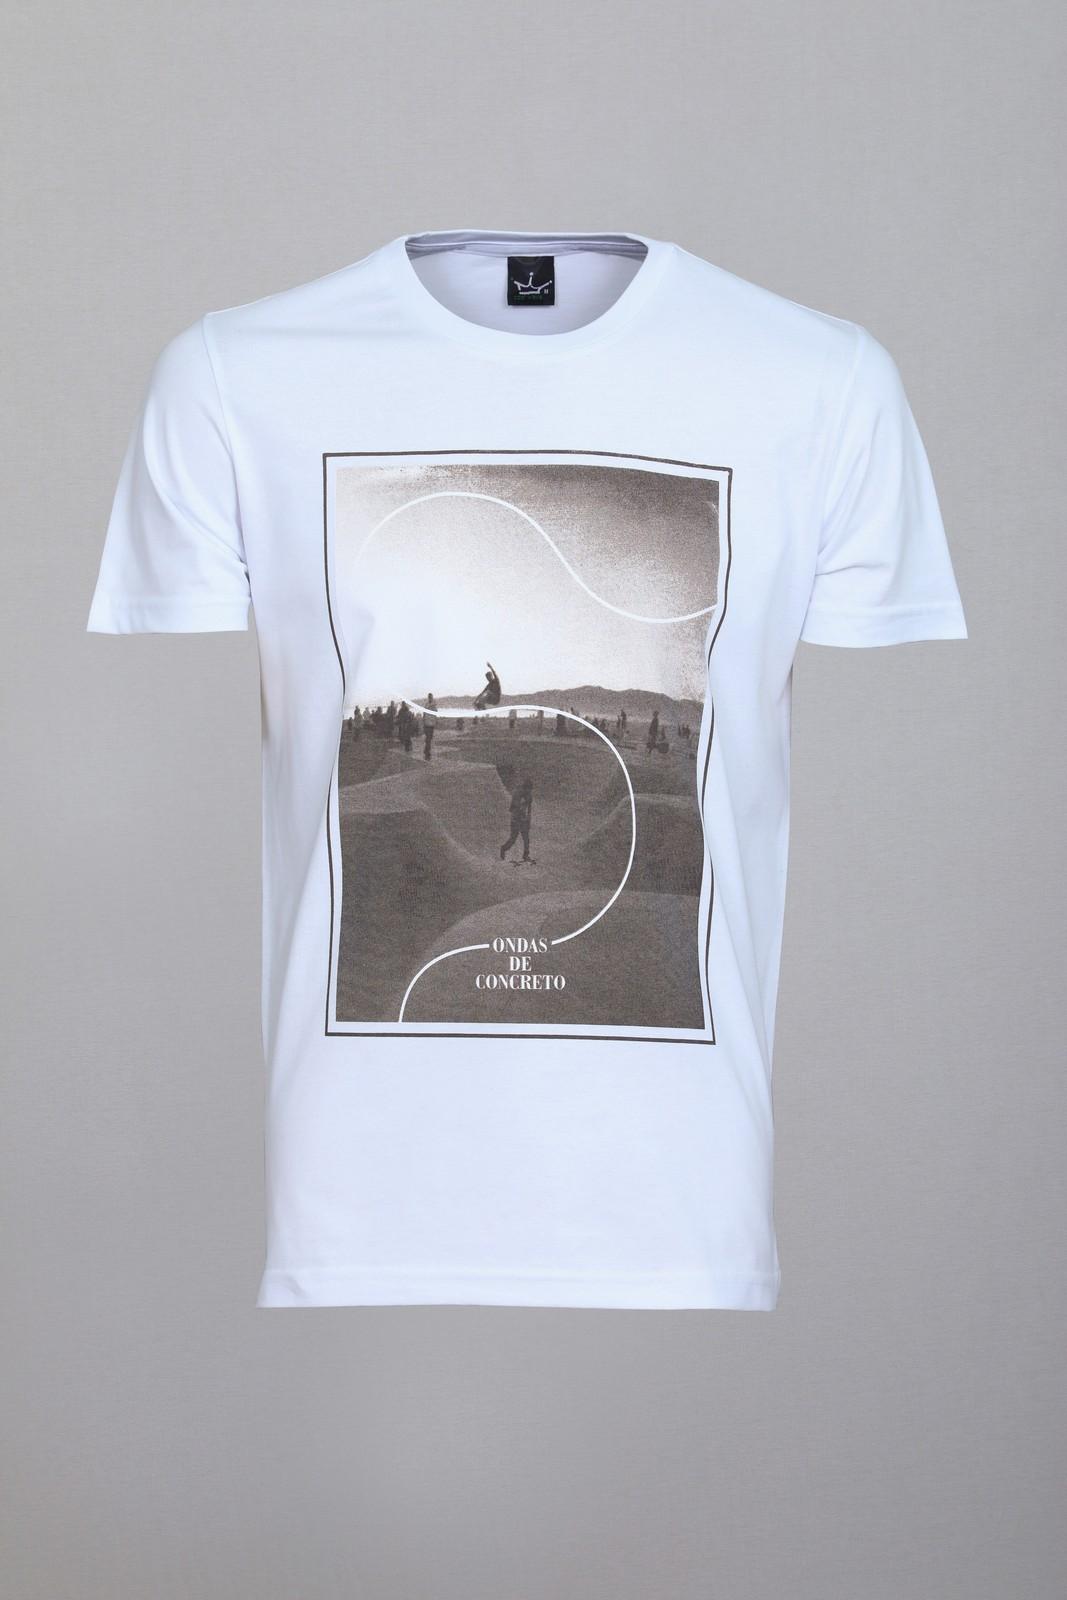 Camiseta CoolWave Concrete Waves